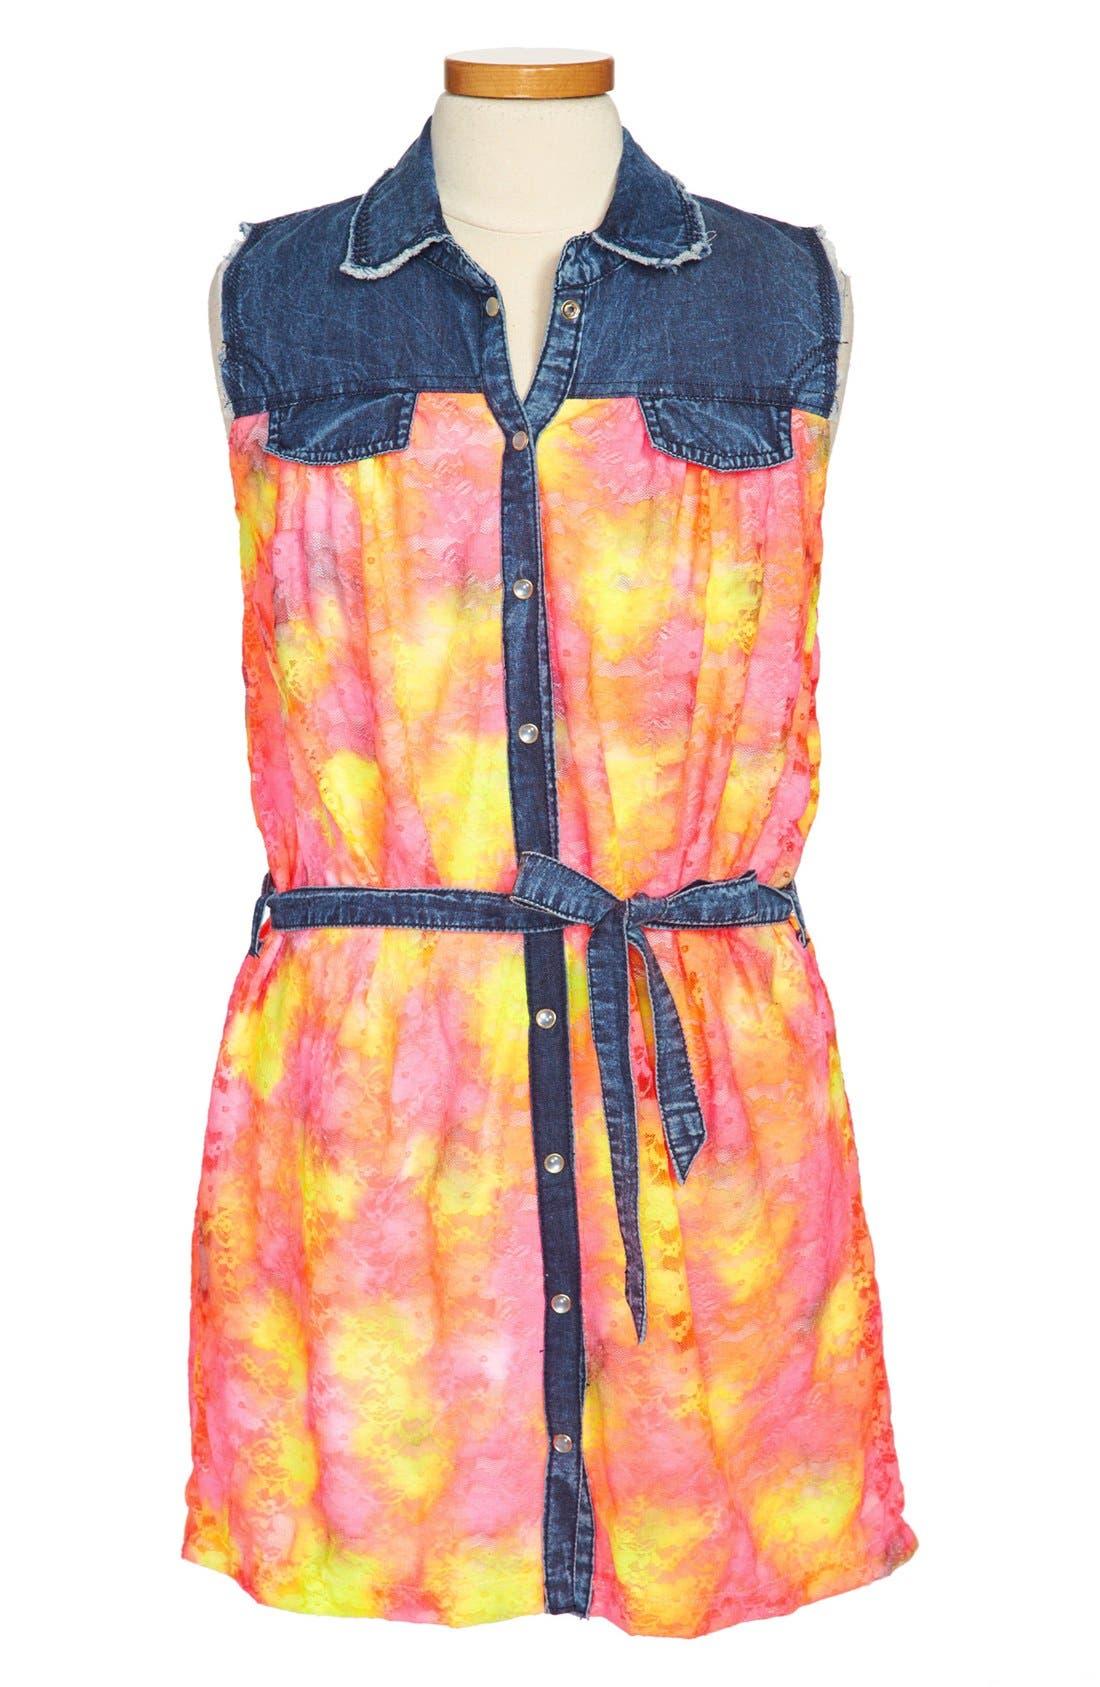 Main Image - Flowers by Zoe Neon Denim Dress (Big Girls)